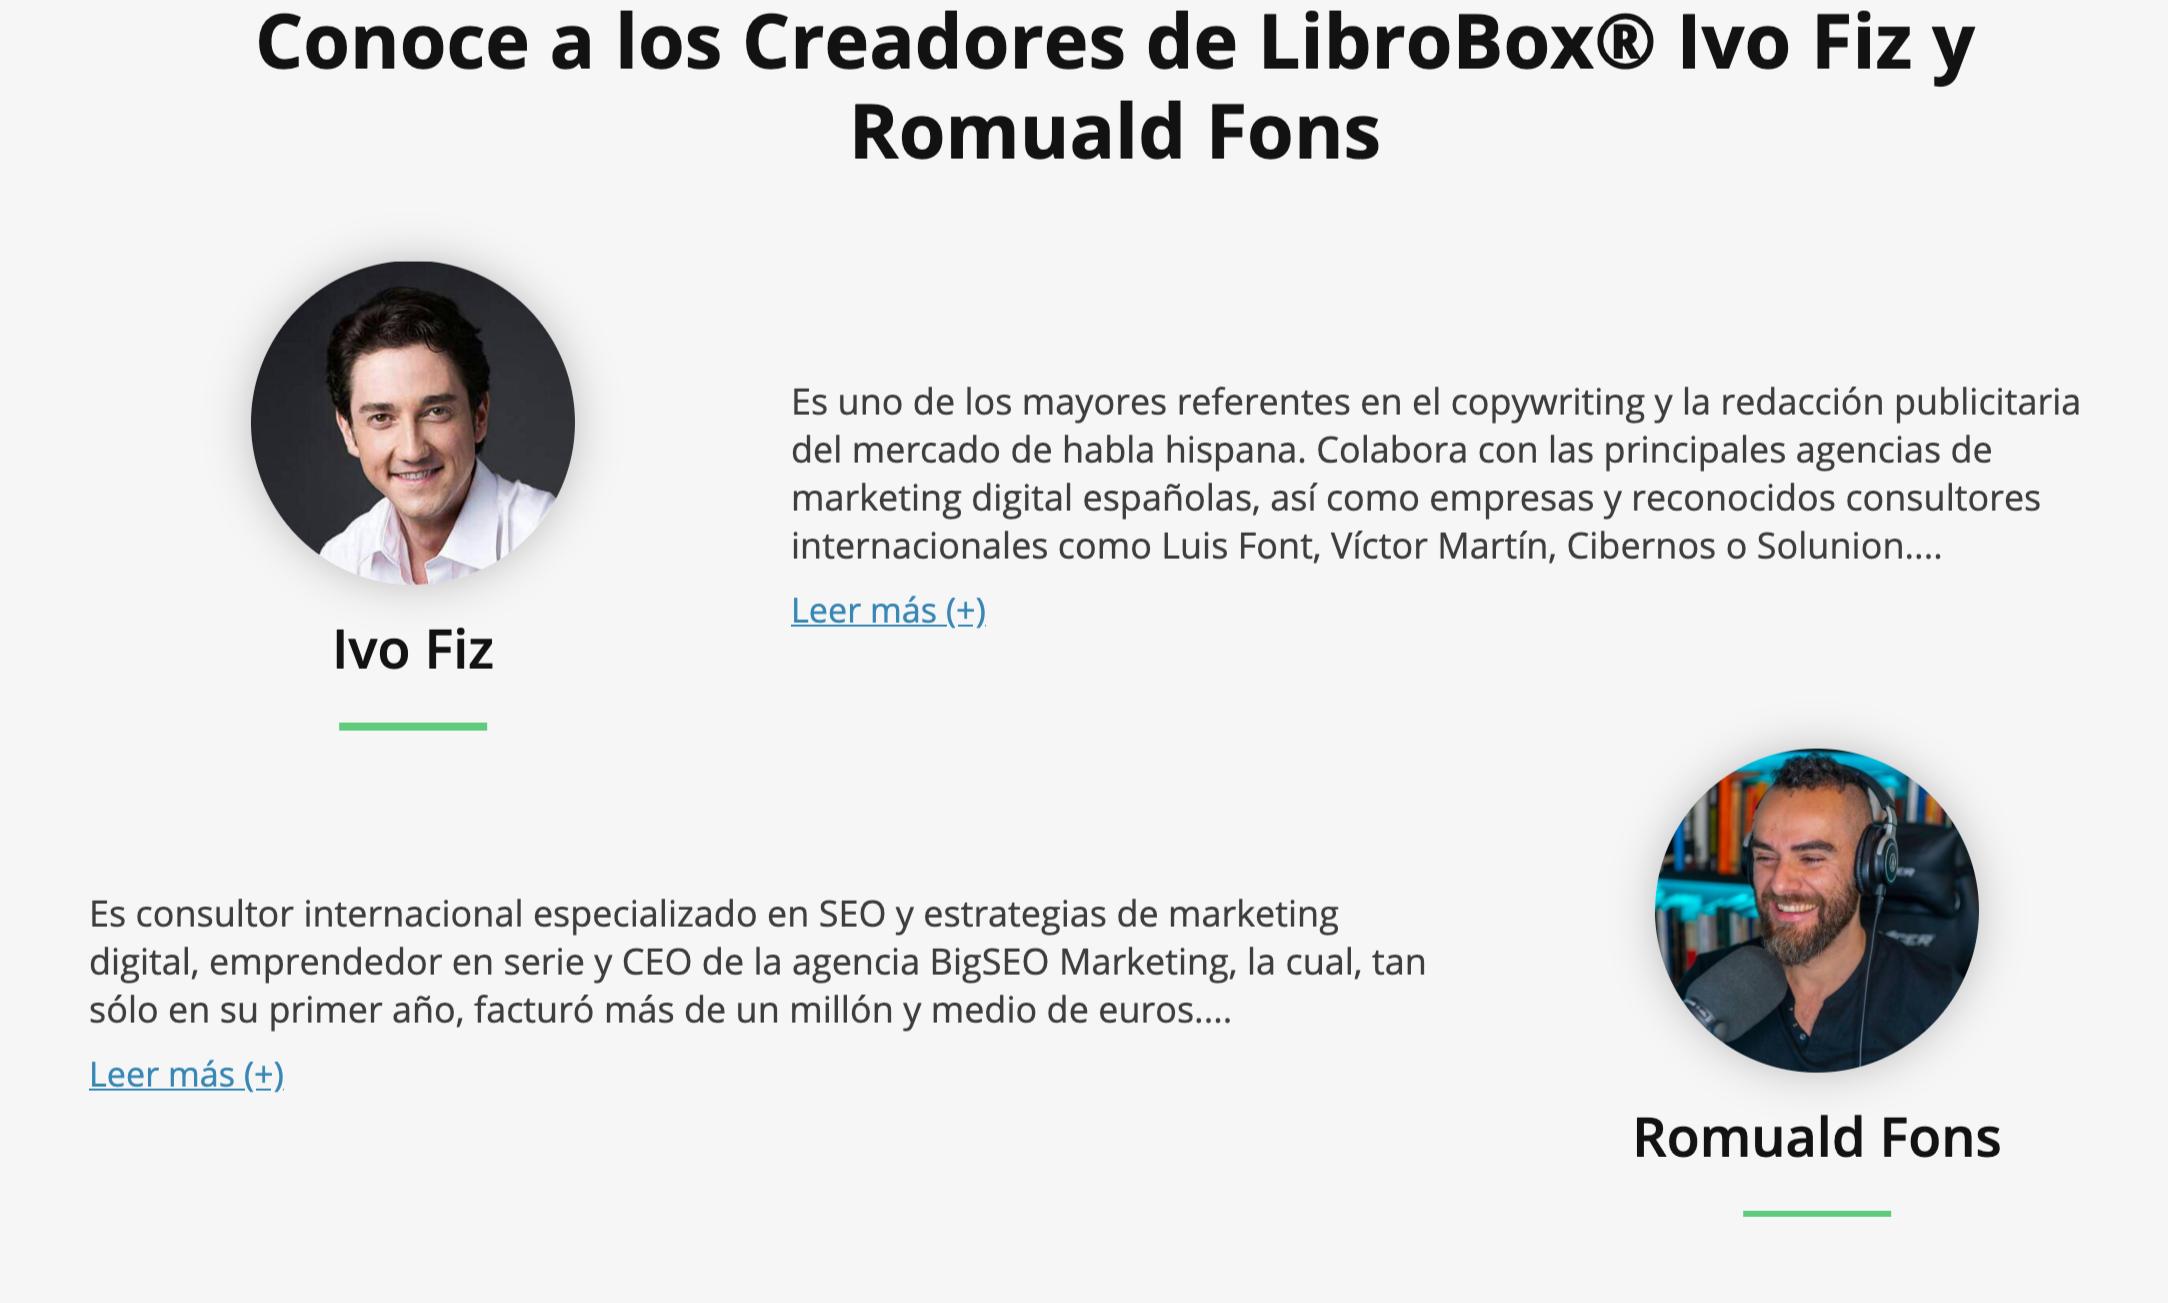 librobox